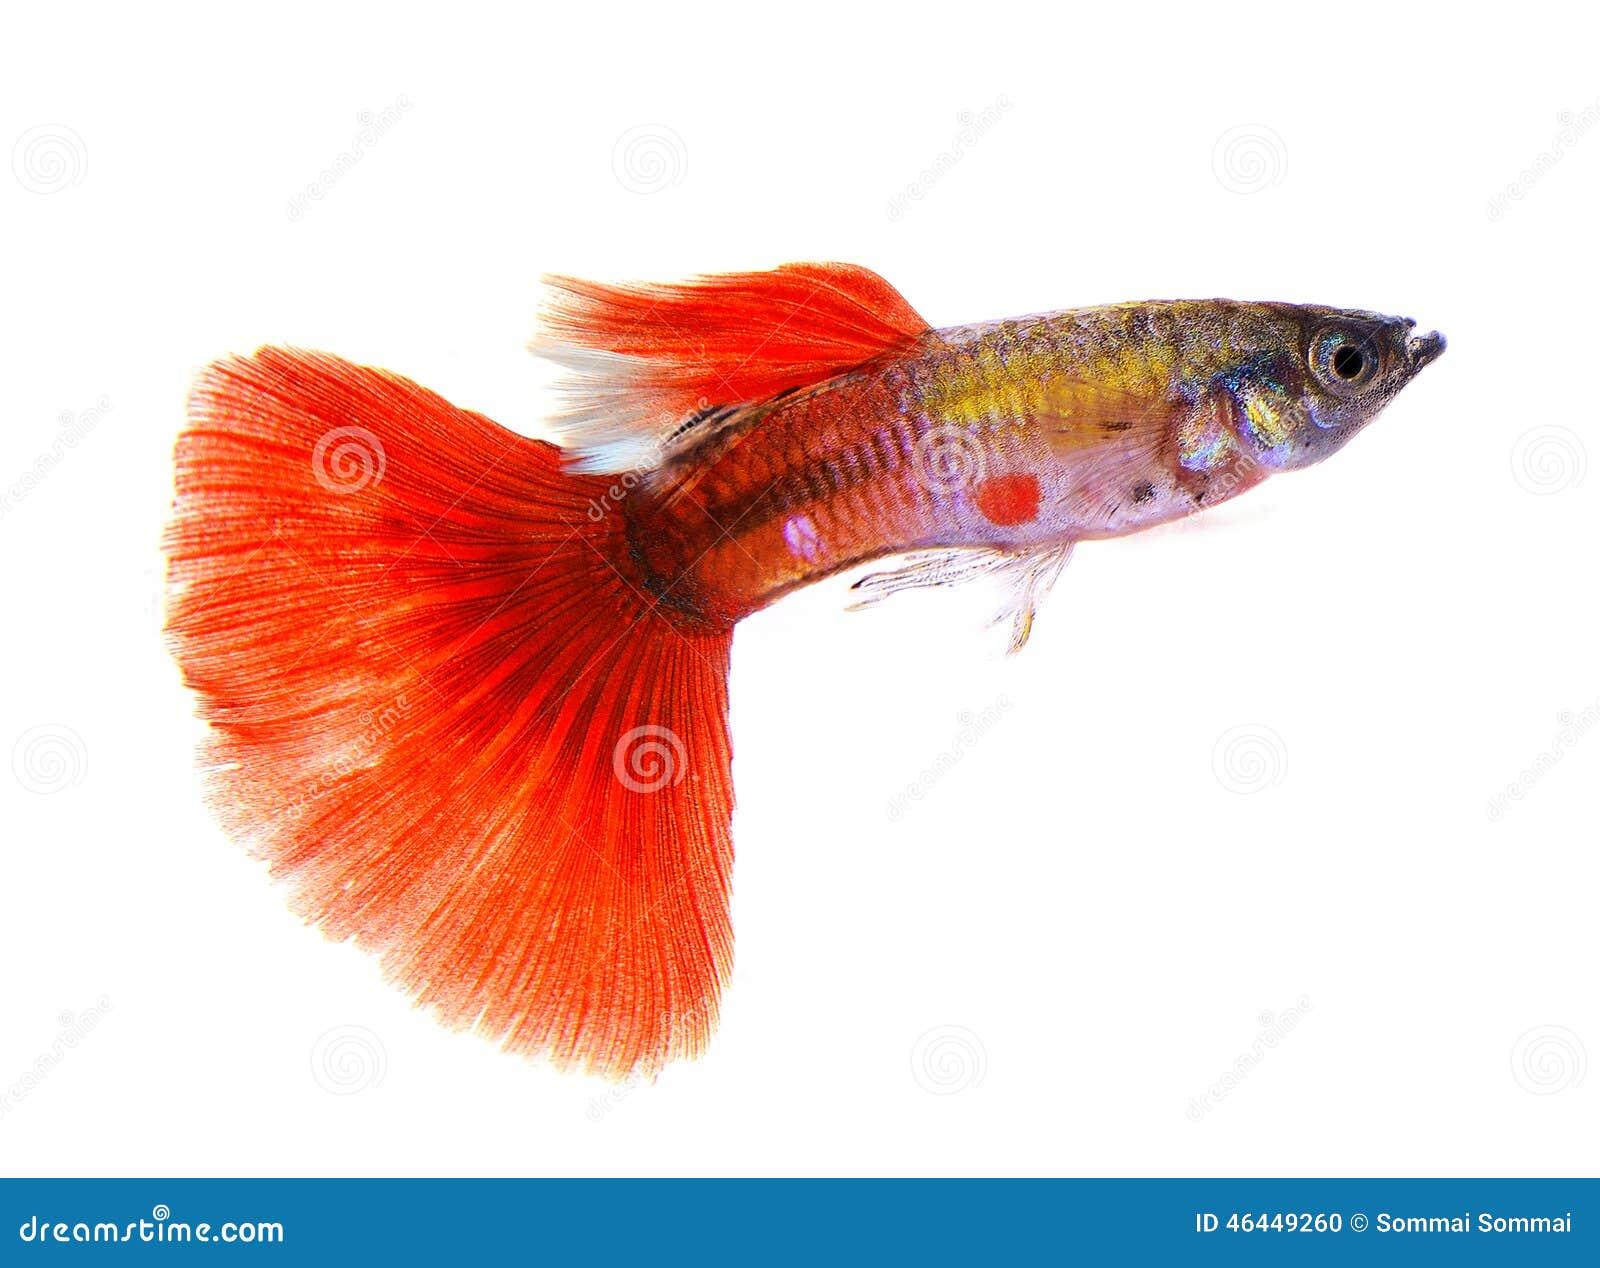 Guppy Fish On White Background Stock Photo - Image of colorful ...